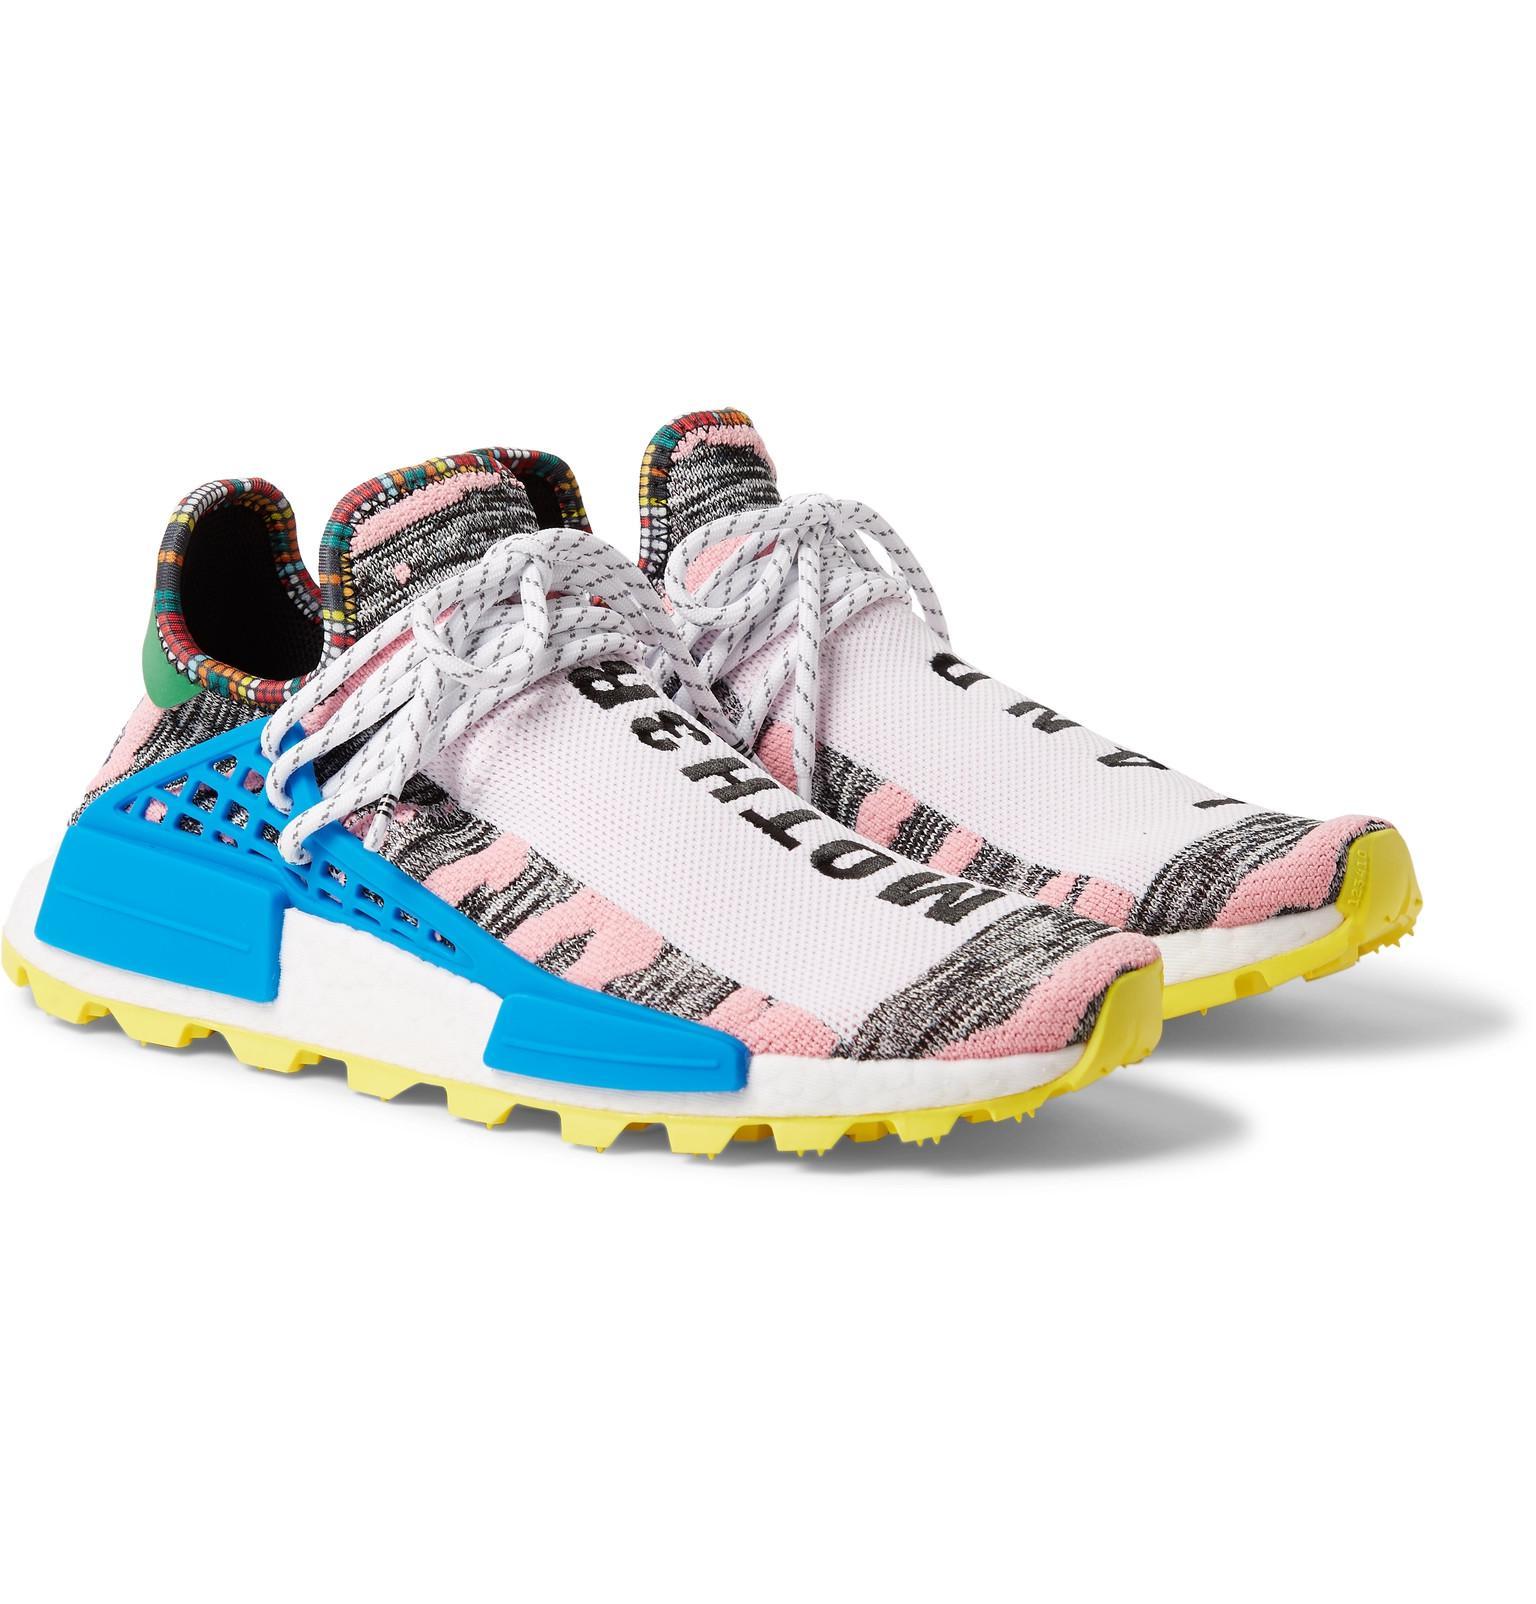 cddbd9a0c1b4e Lyst - adidas Originals + Pharrell Williams Solarhu Nmd Primeknit ...